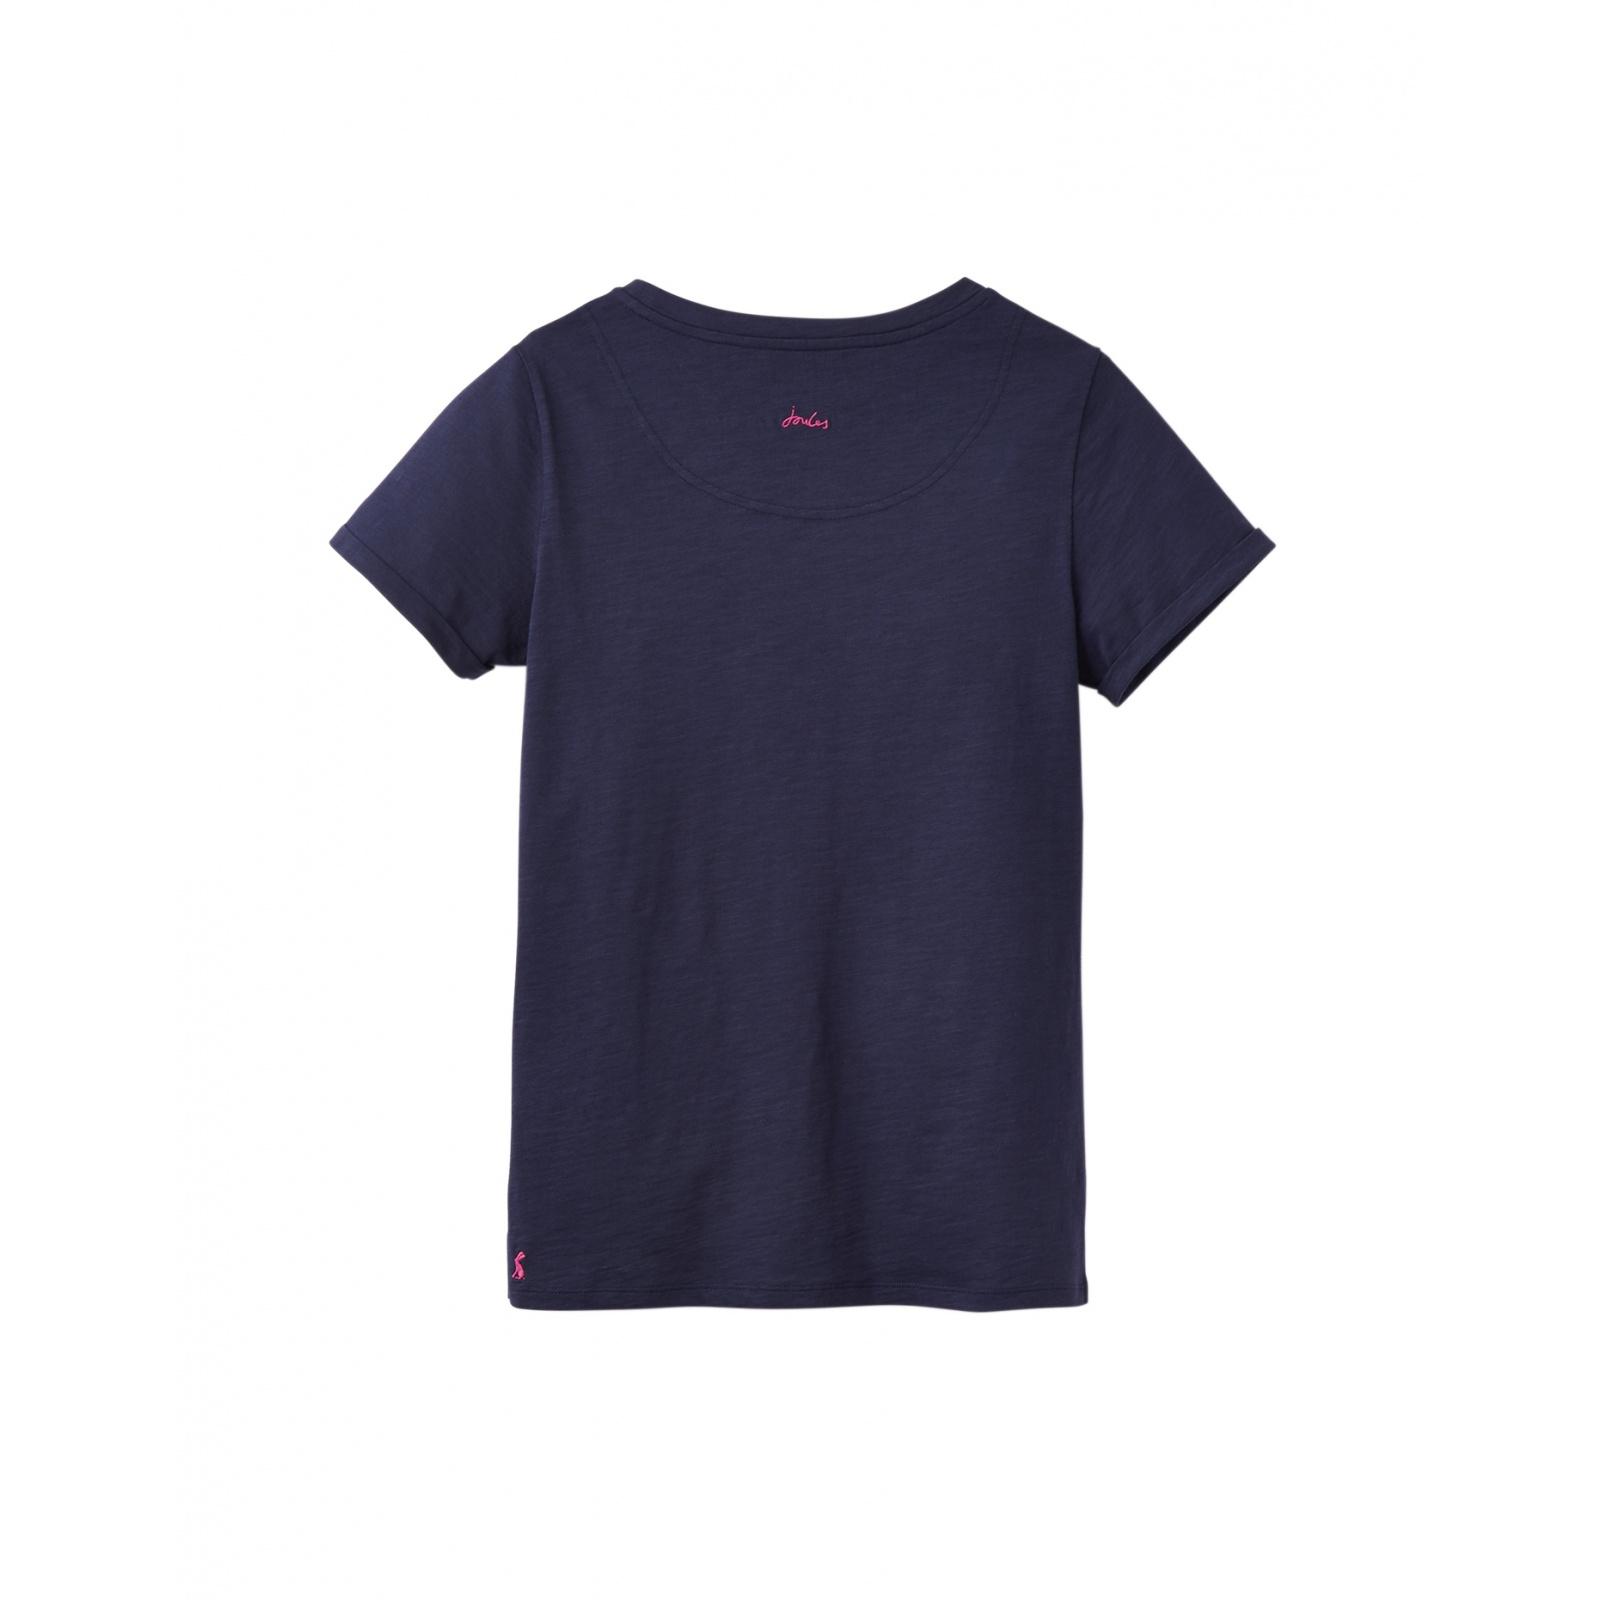 Joules-Nessa-ligero-Jersey-Camiseta-SS19 miniatura 18